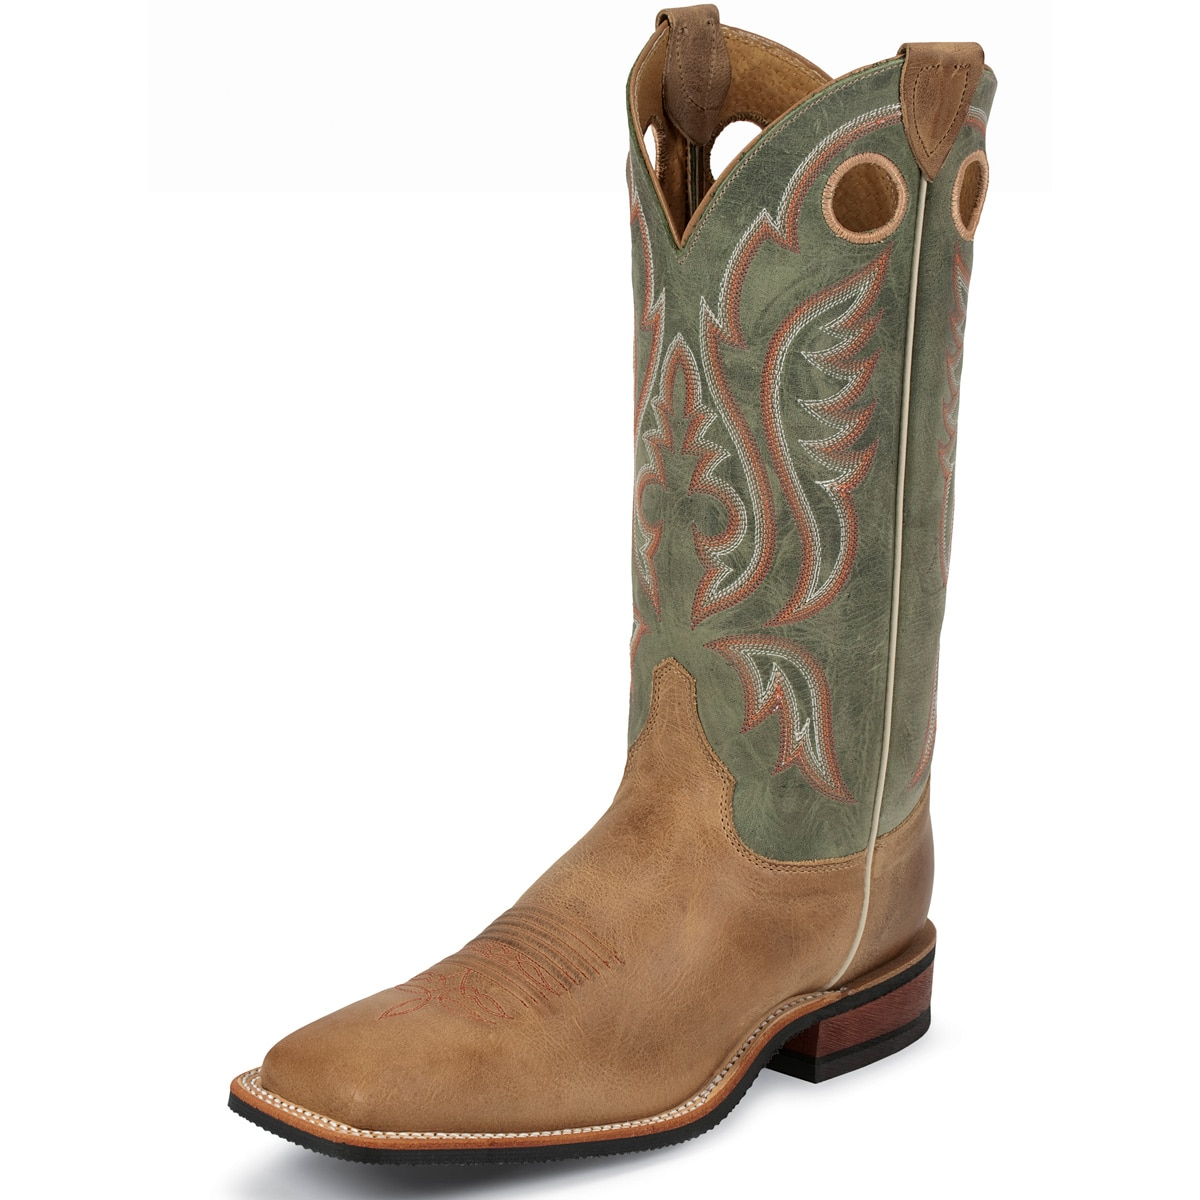 Justin Men's Jacksboro Boots - Sage Cowhide